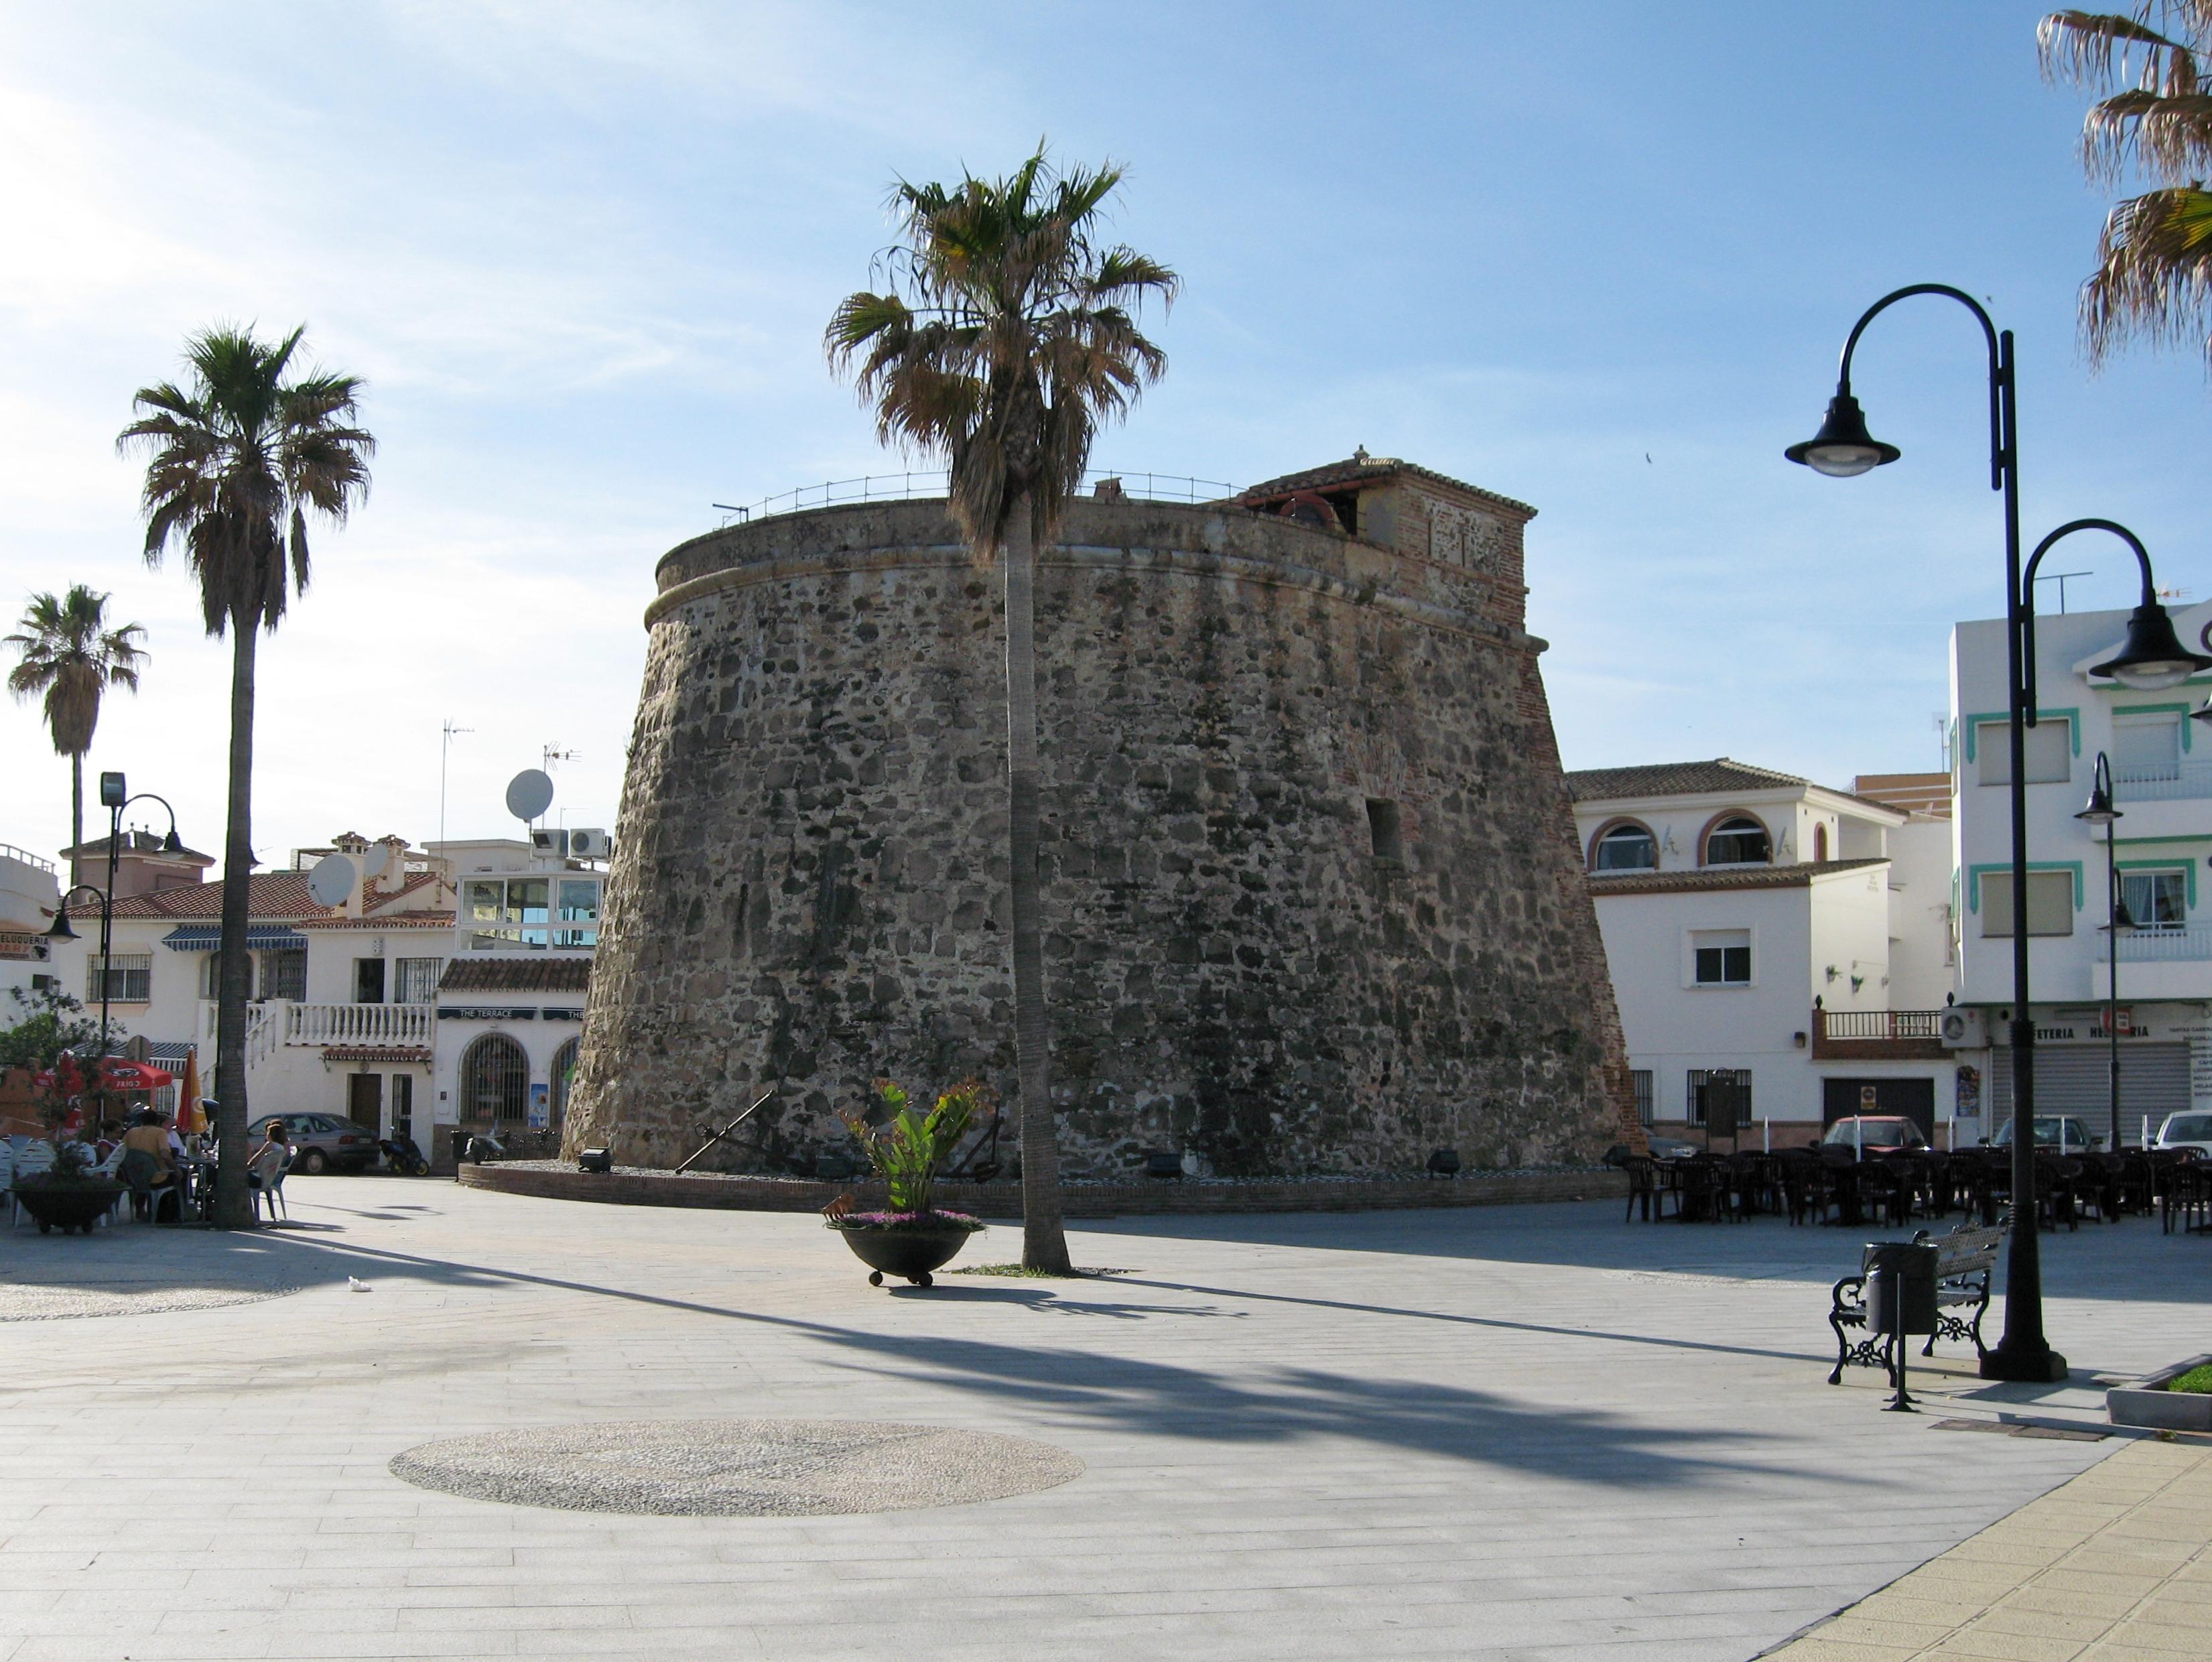 La Cala de Mijas Spain  City new picture : Description La Cala de Mijas 04